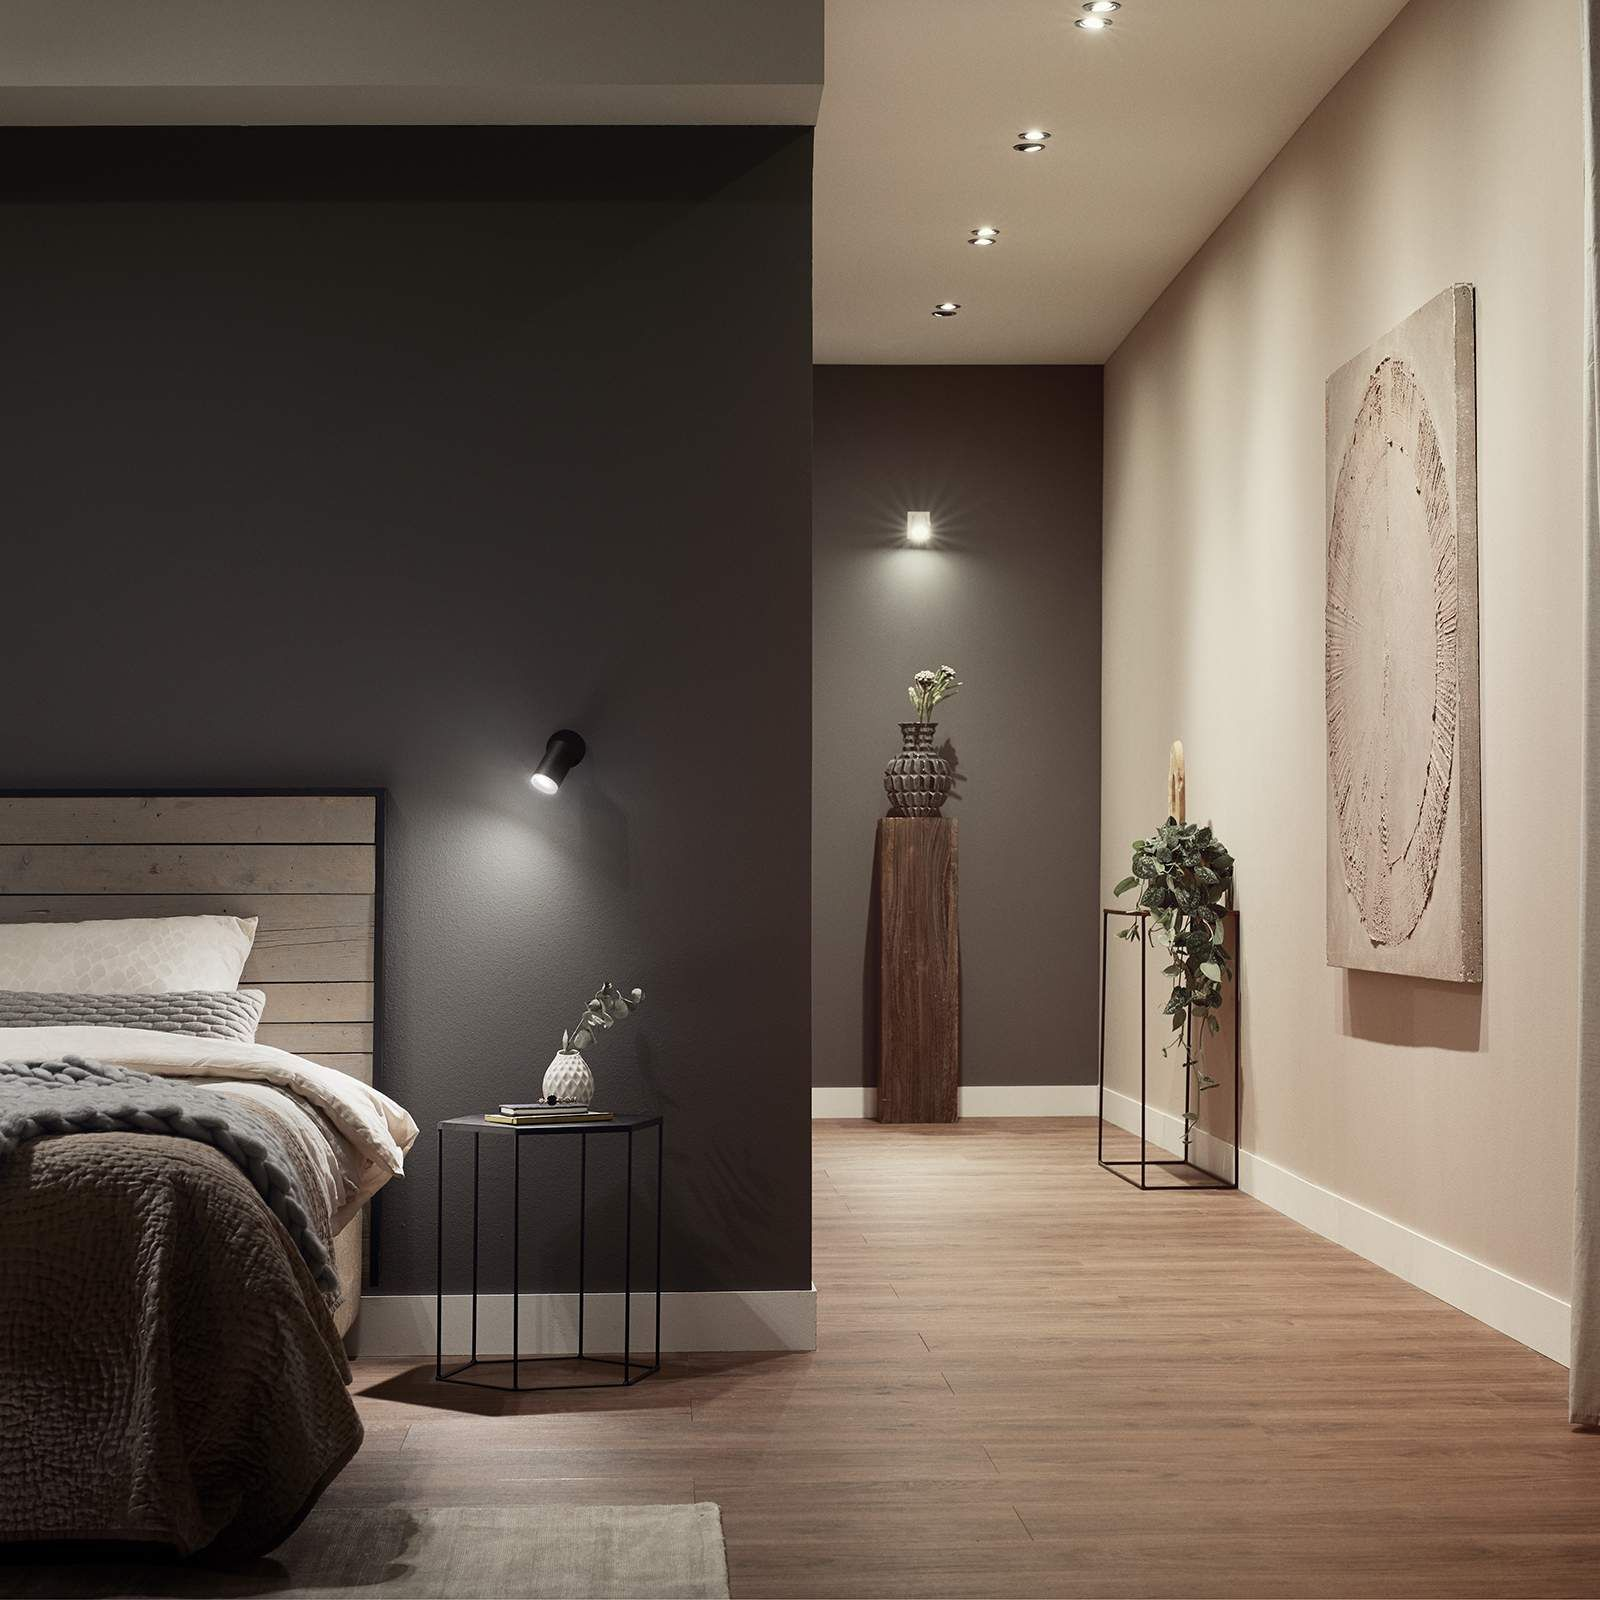 Philips Hue White Ambiance 5 W Gu10 Led Lampe In 2020 Led Lampe